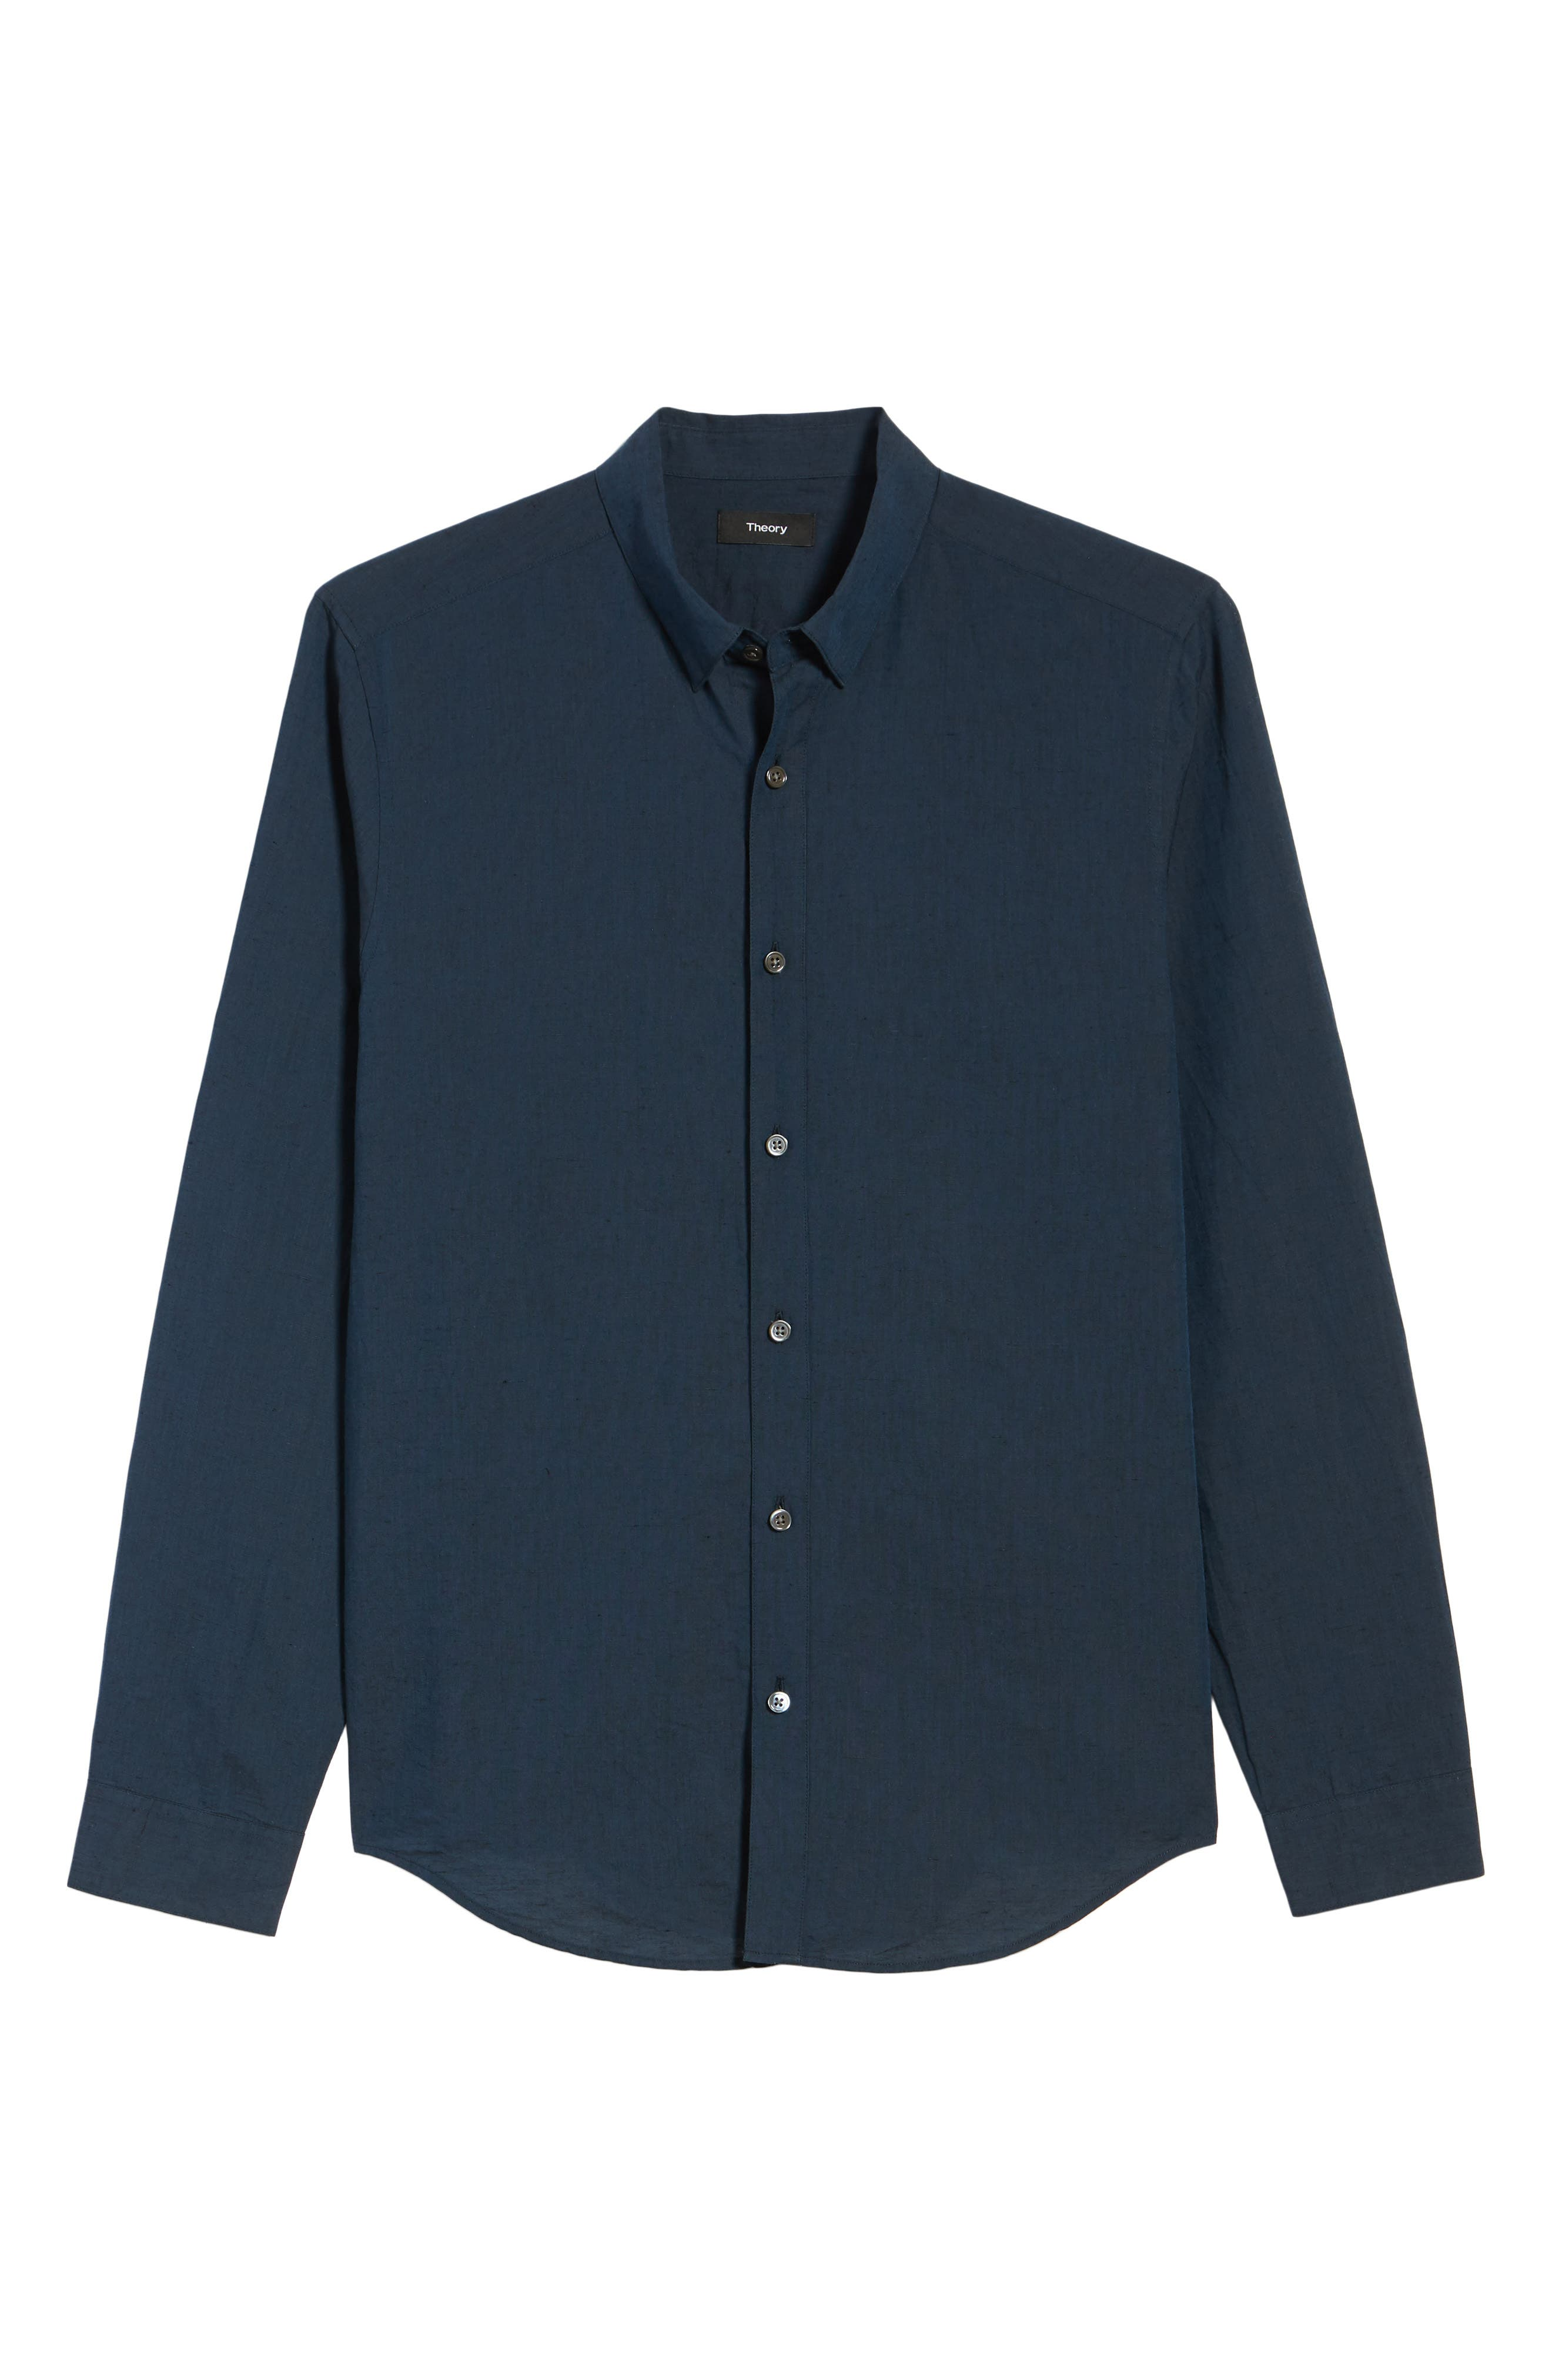 Edward Regular Fit Linen & Cotton Sport Shirt,                             Alternate thumbnail 6, color,                             Finch